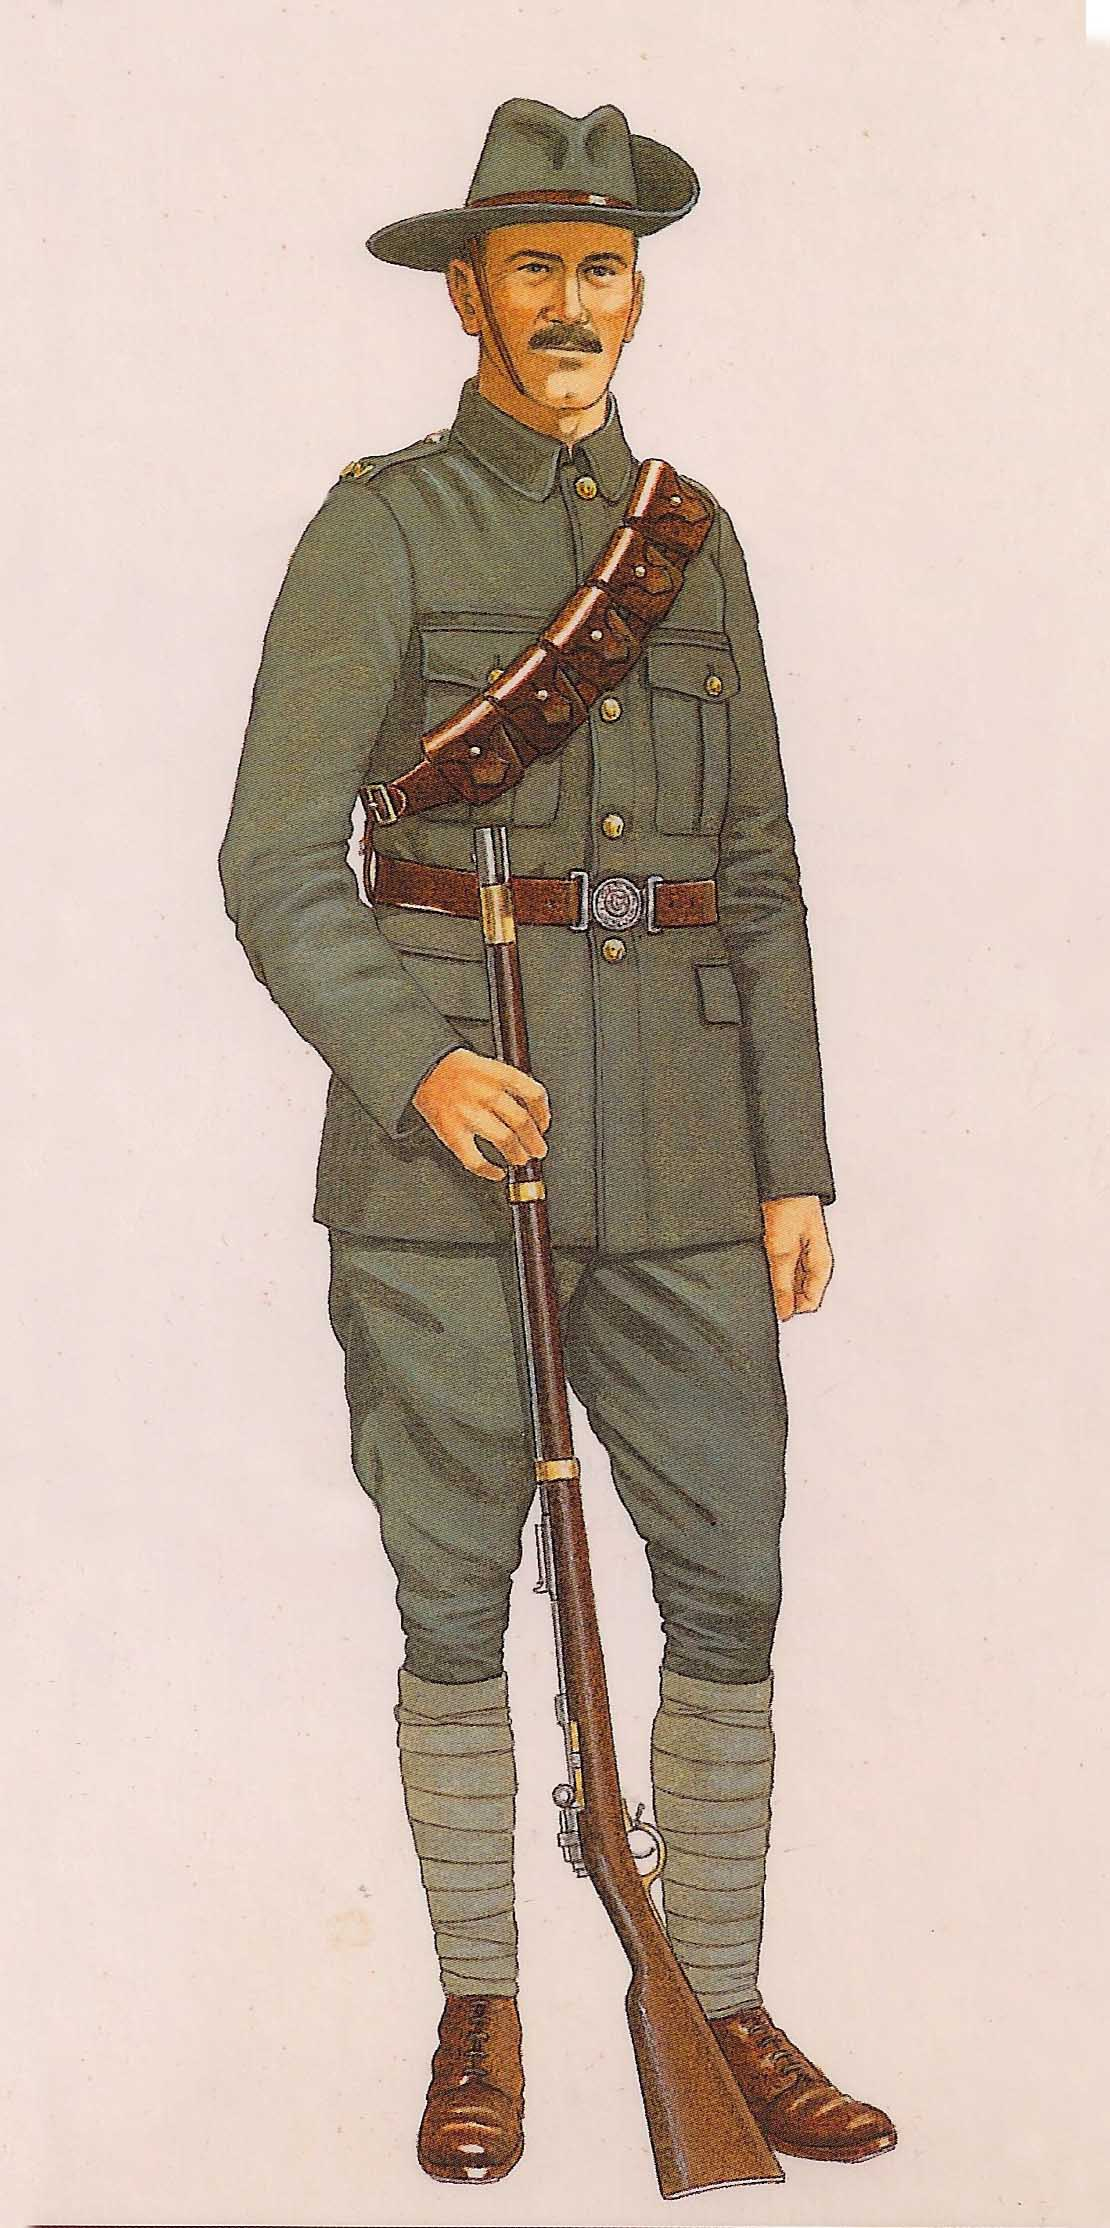 Irish Volunteer soldier 1913-23